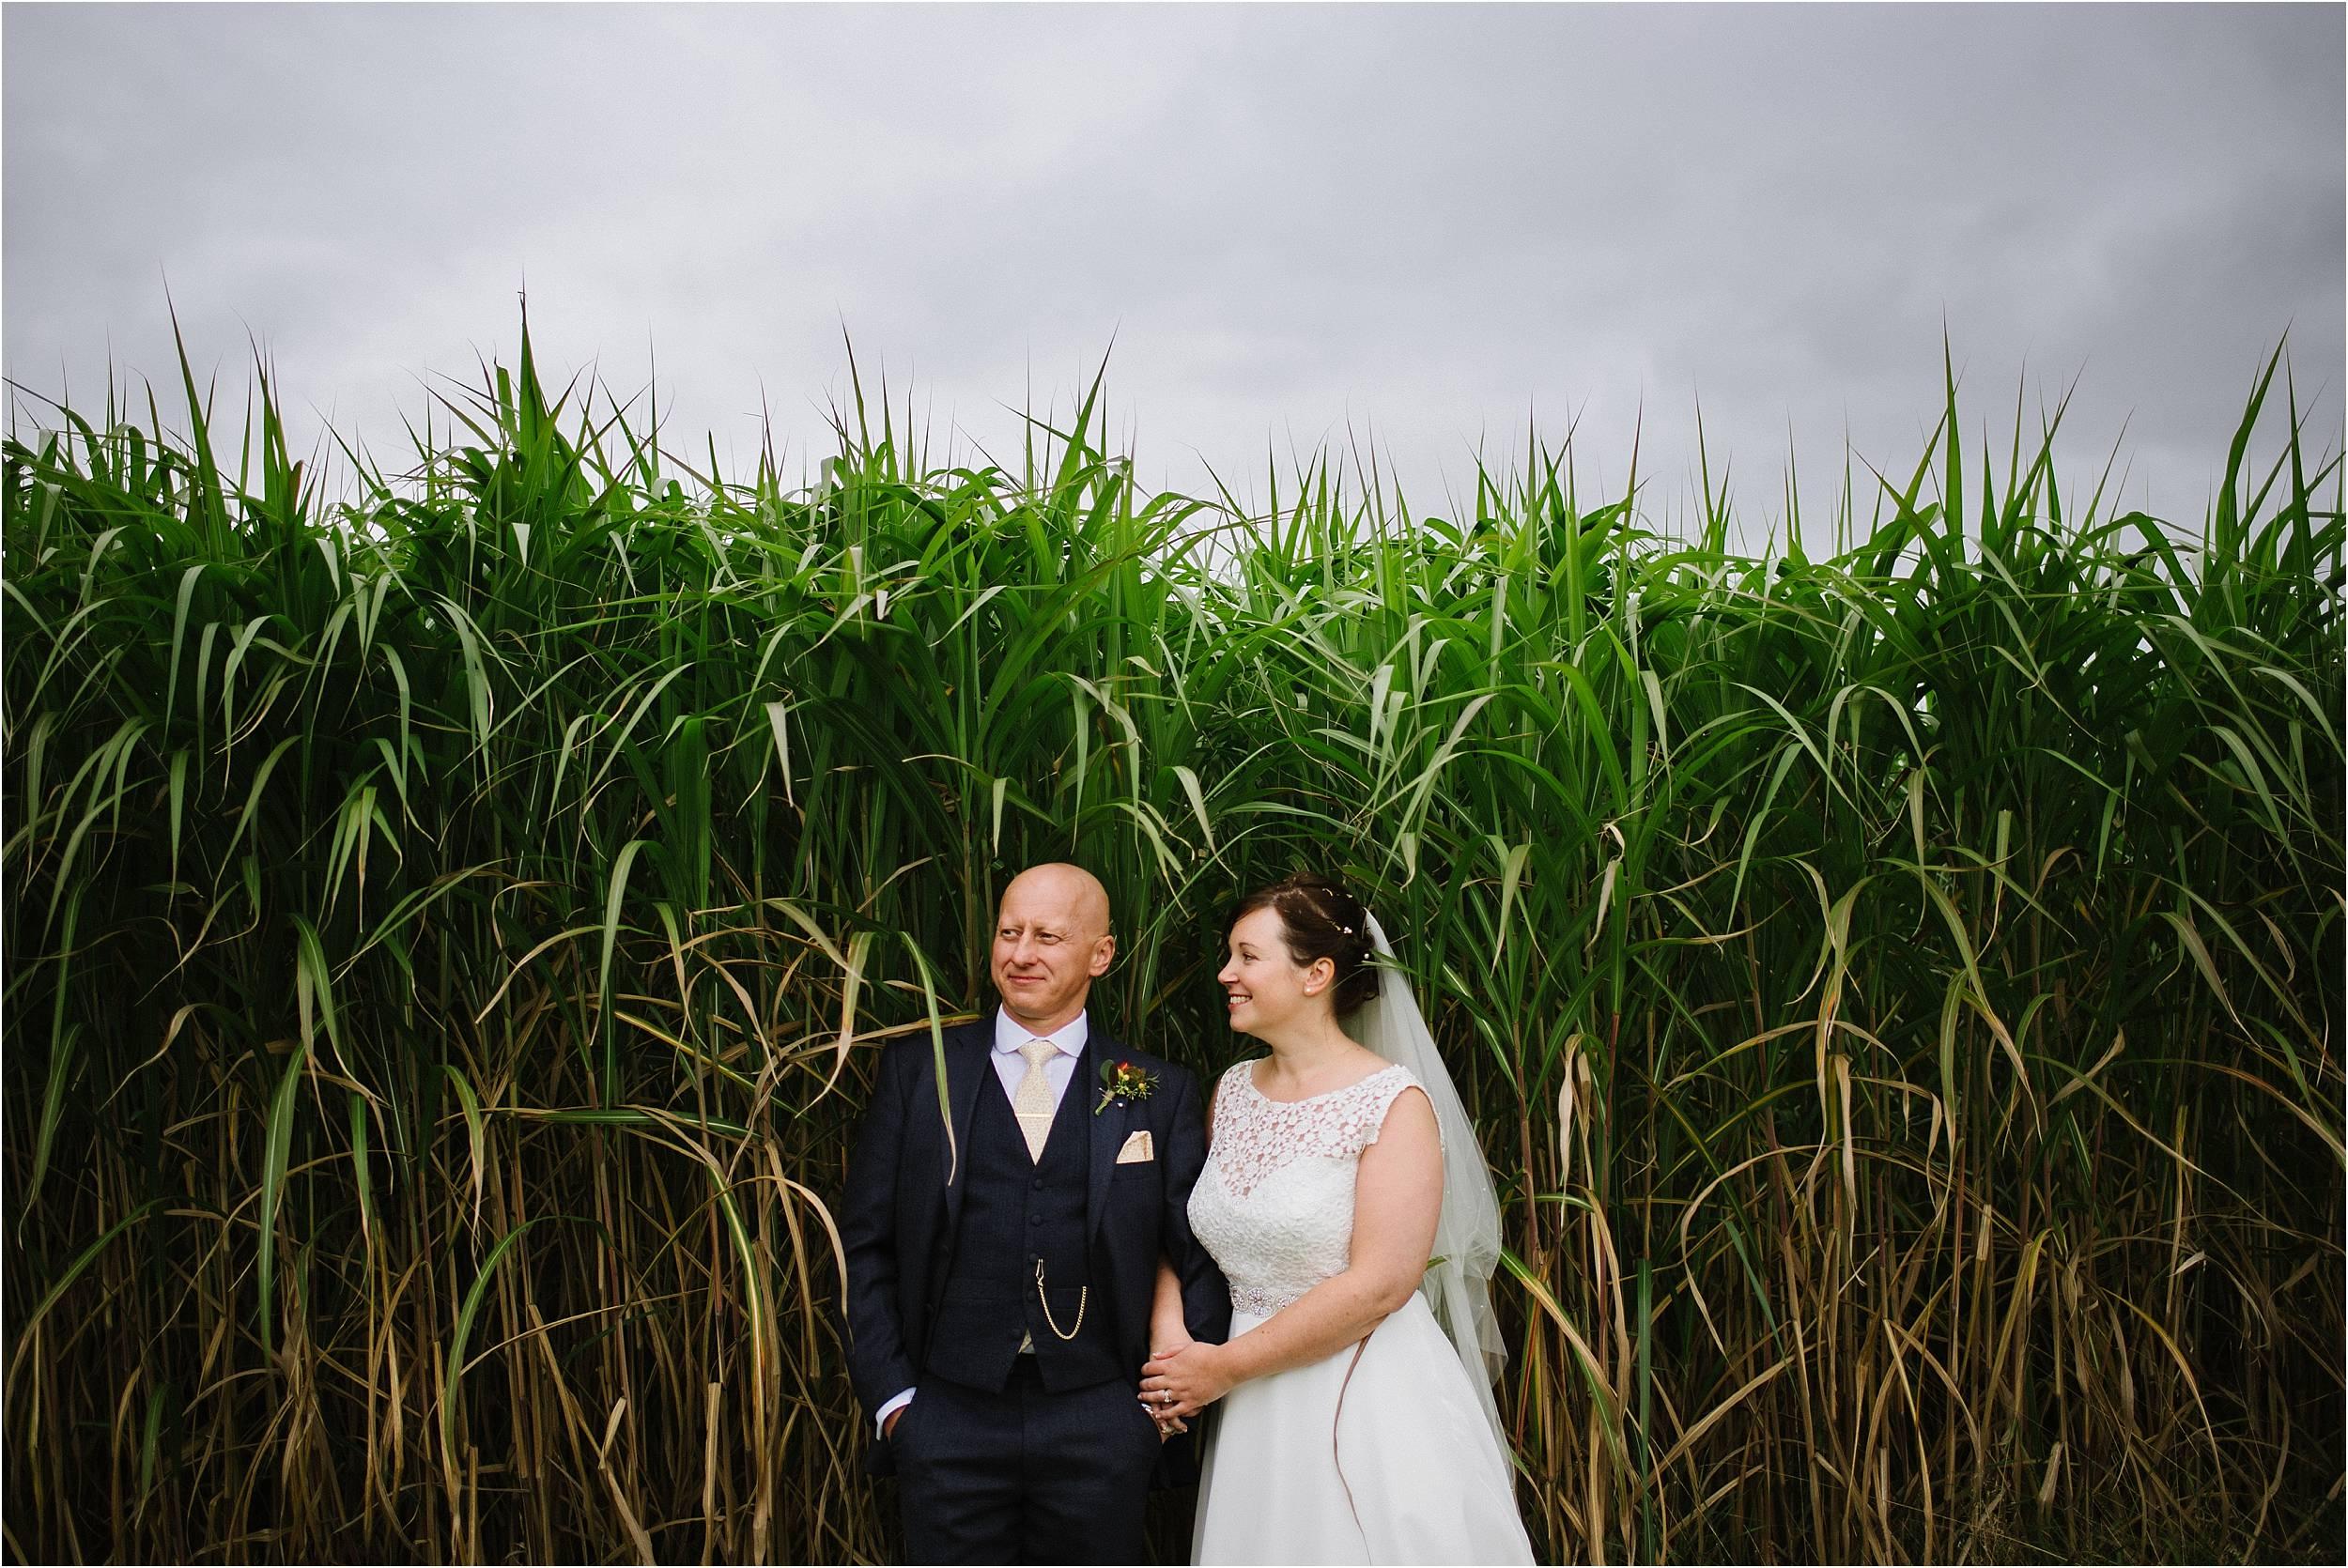 Staffordshire Wedding Photography_0066.jpg